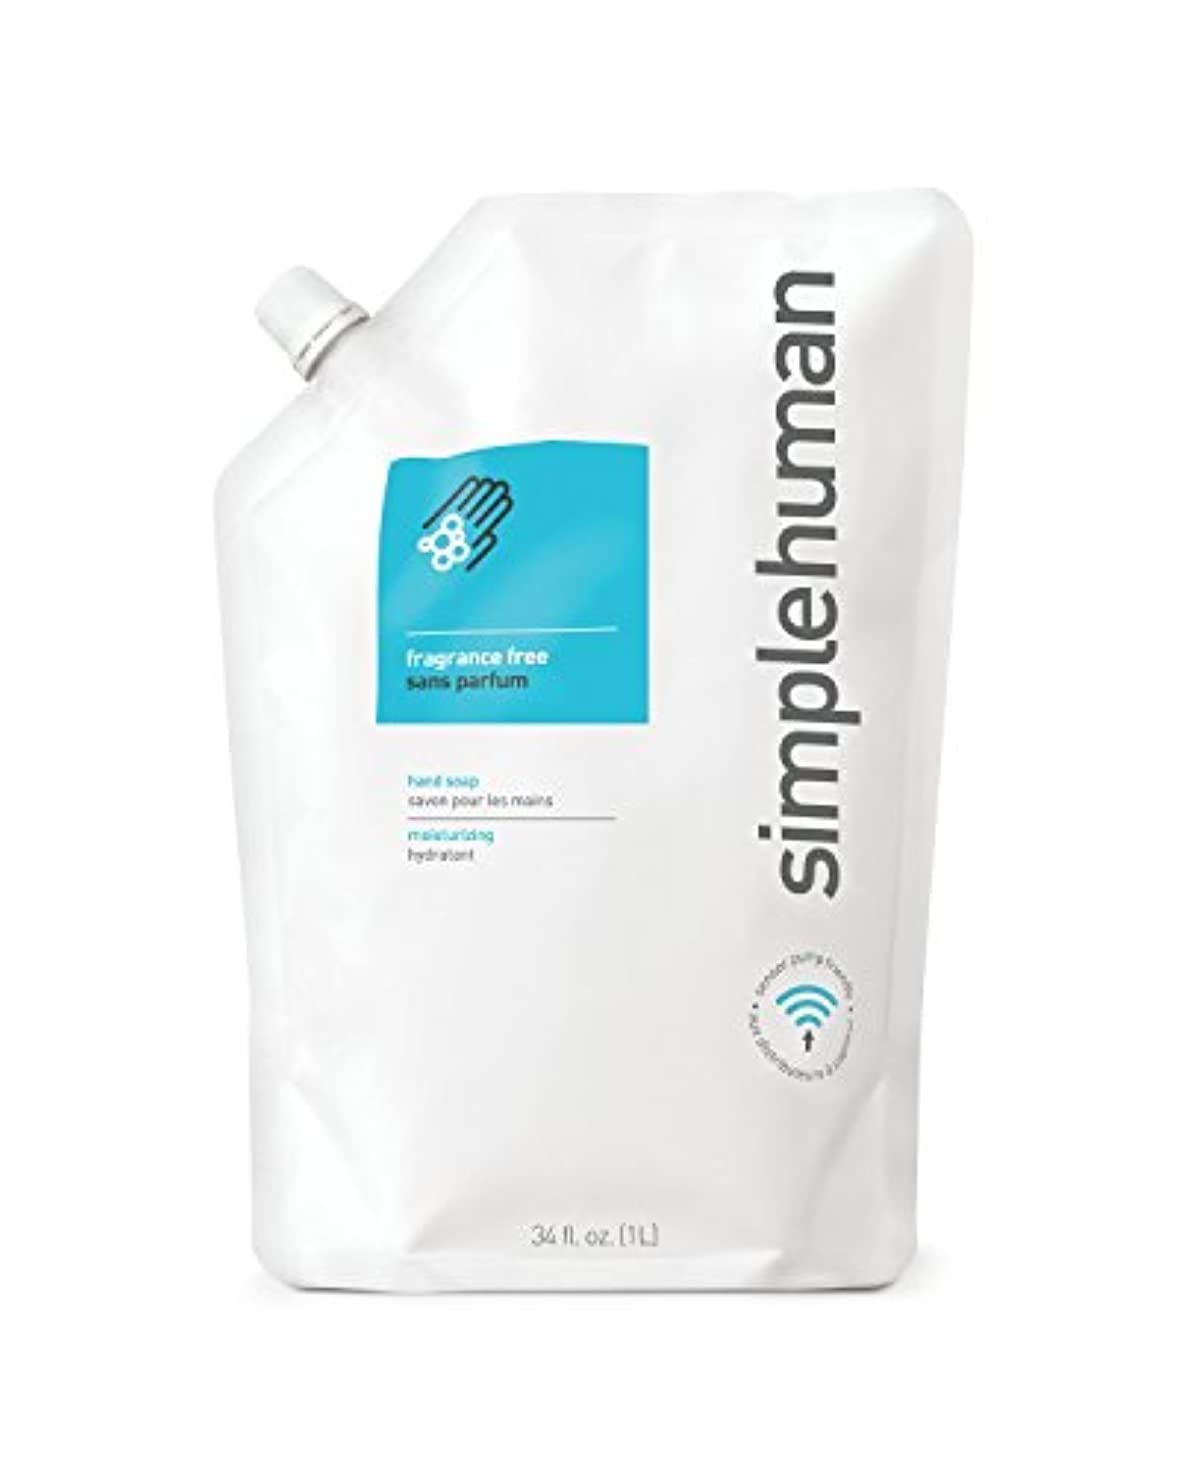 simplehuman(シンプルヒューマン) 保湿液体ハンドソープ詰め替えパウチ 1 Pack オフホワイト CT1023